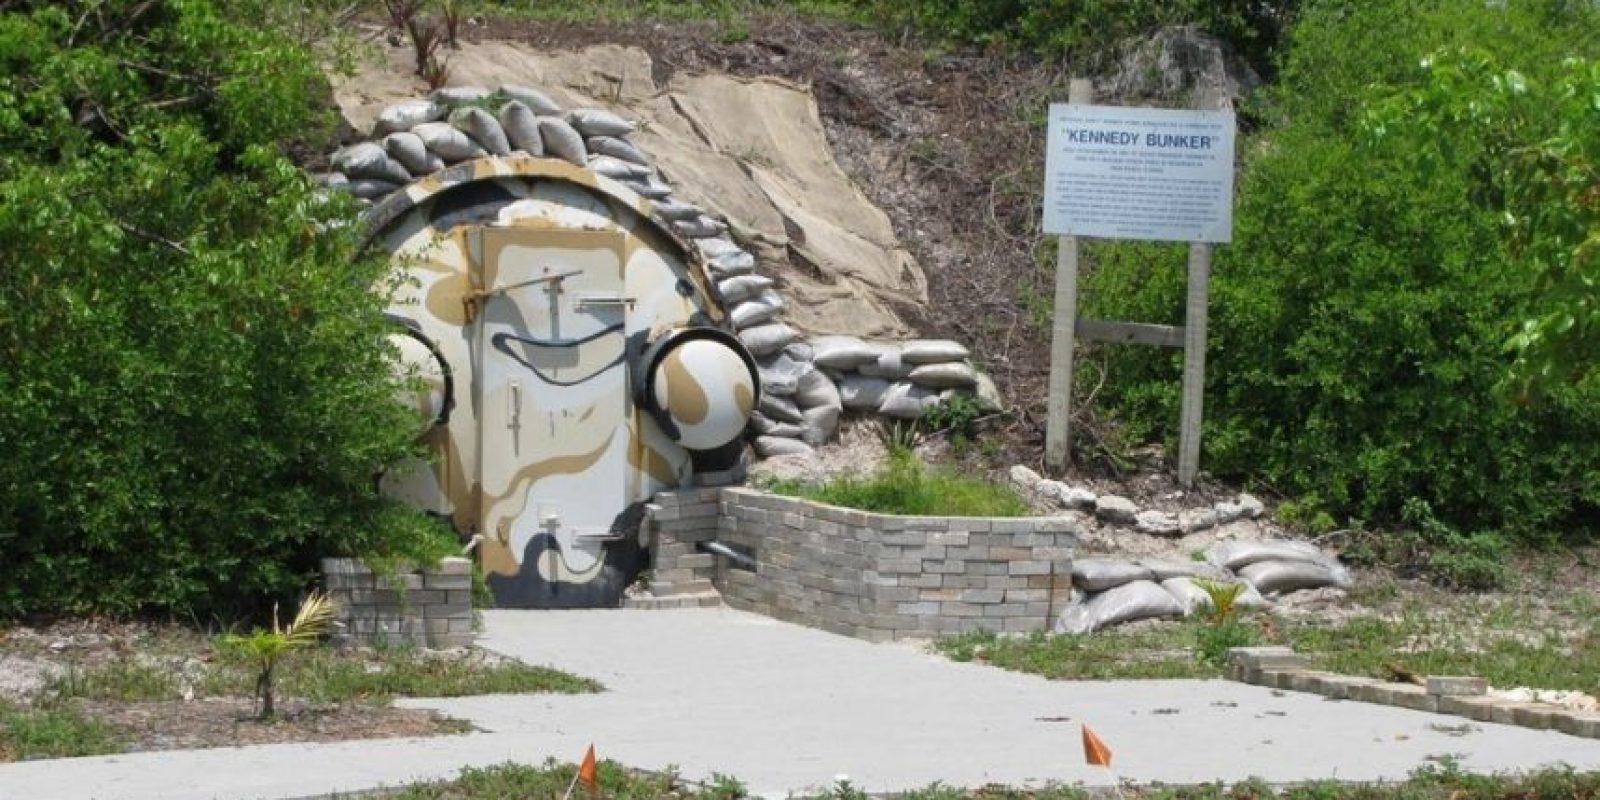 The Kennedy Bunker, Florida Foto:3.bp.blogspot.com